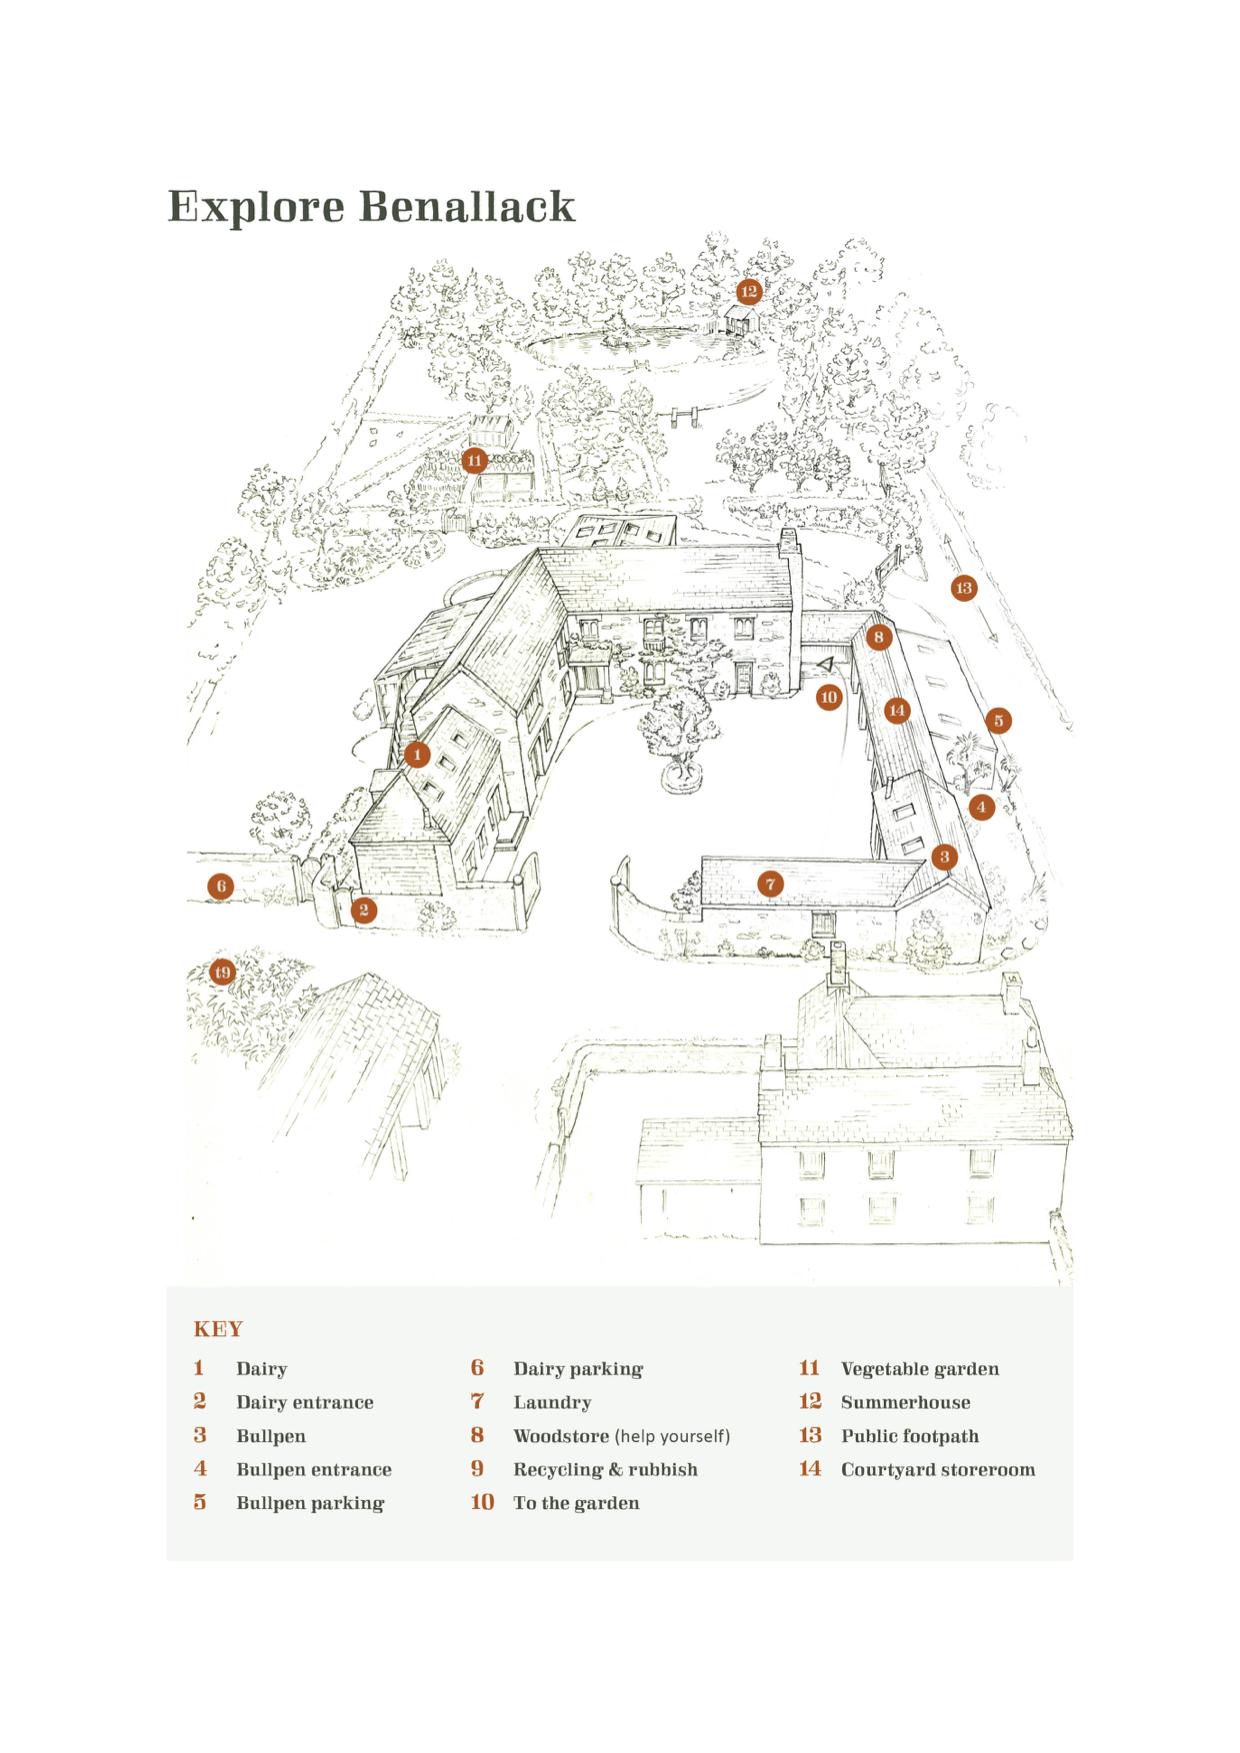 Explore Benallack Map